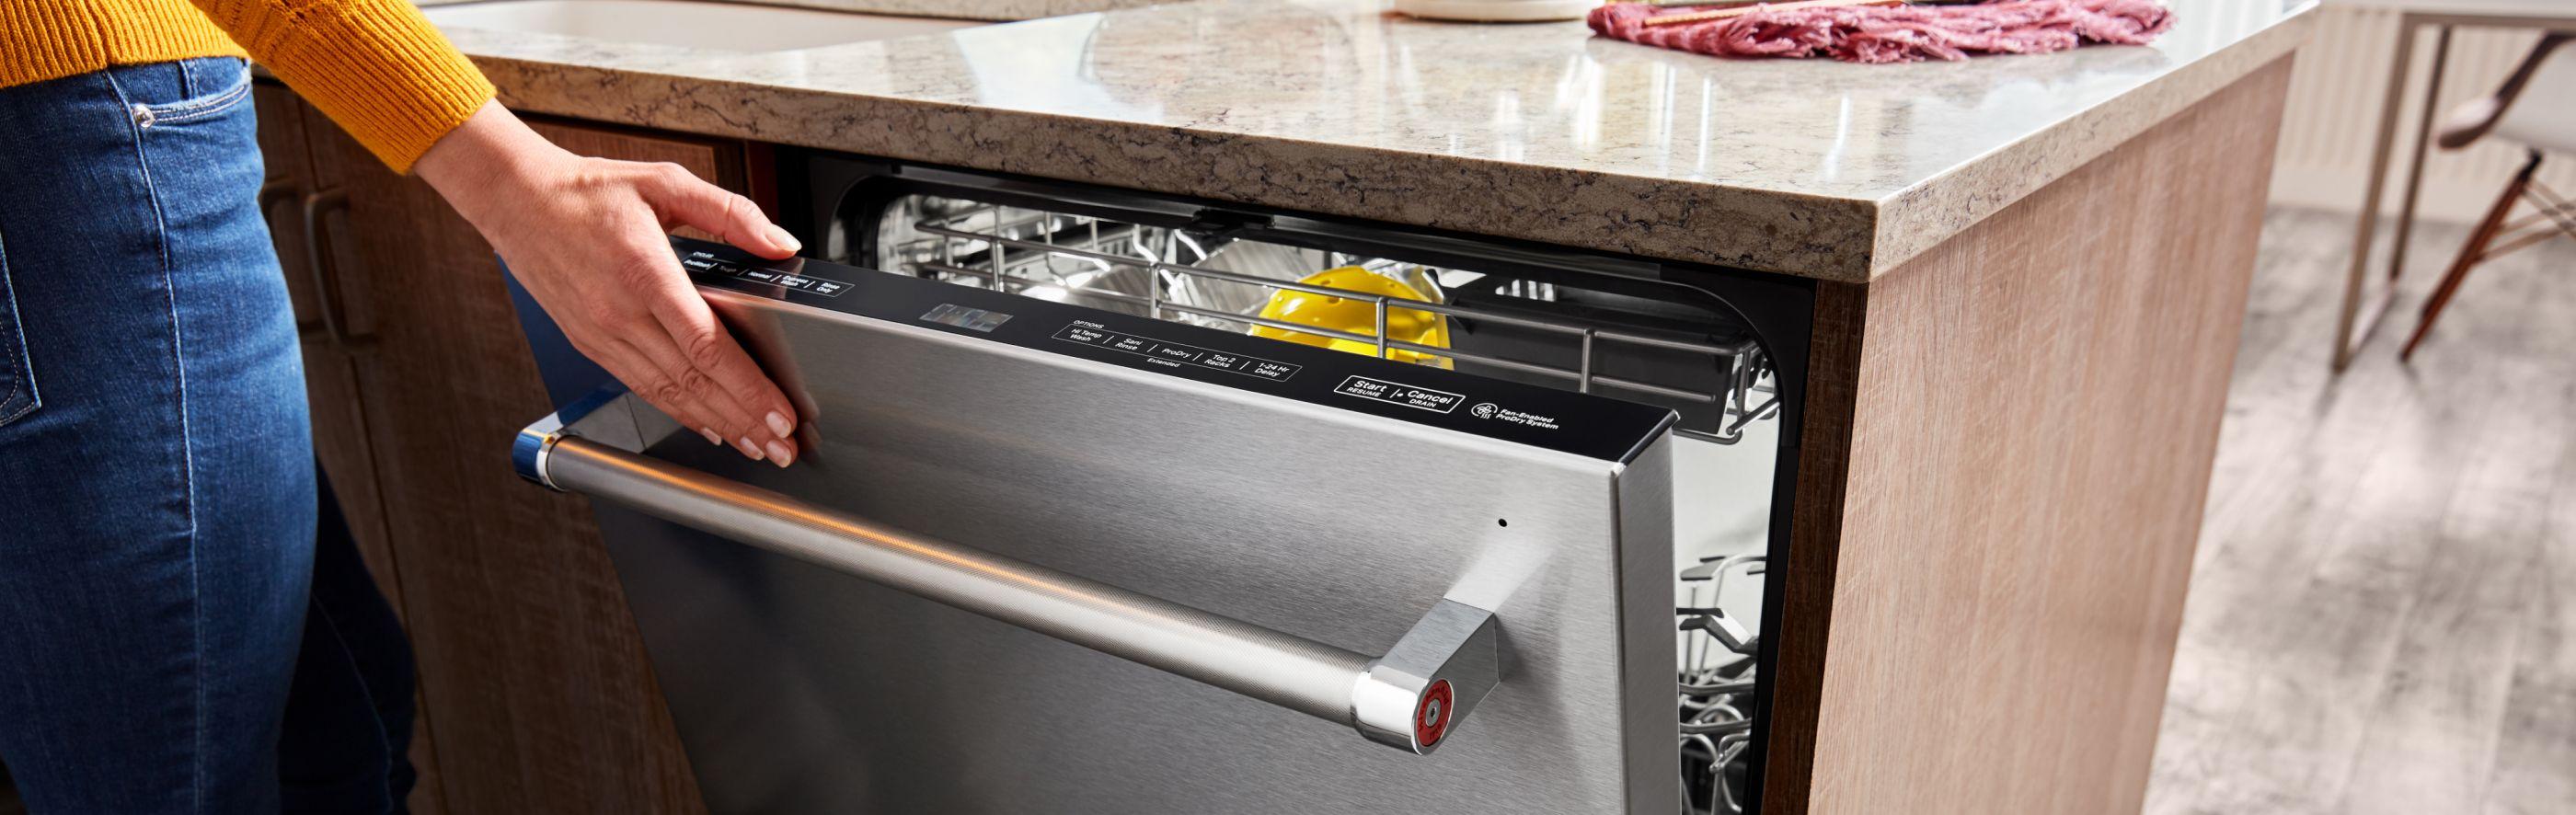 Hand closing top control dishwasher